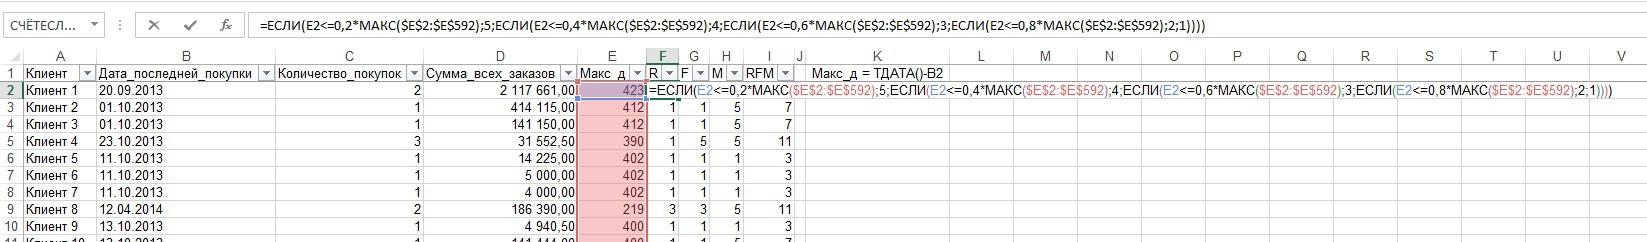 RFM-анализ на коленке (Excel) - 4